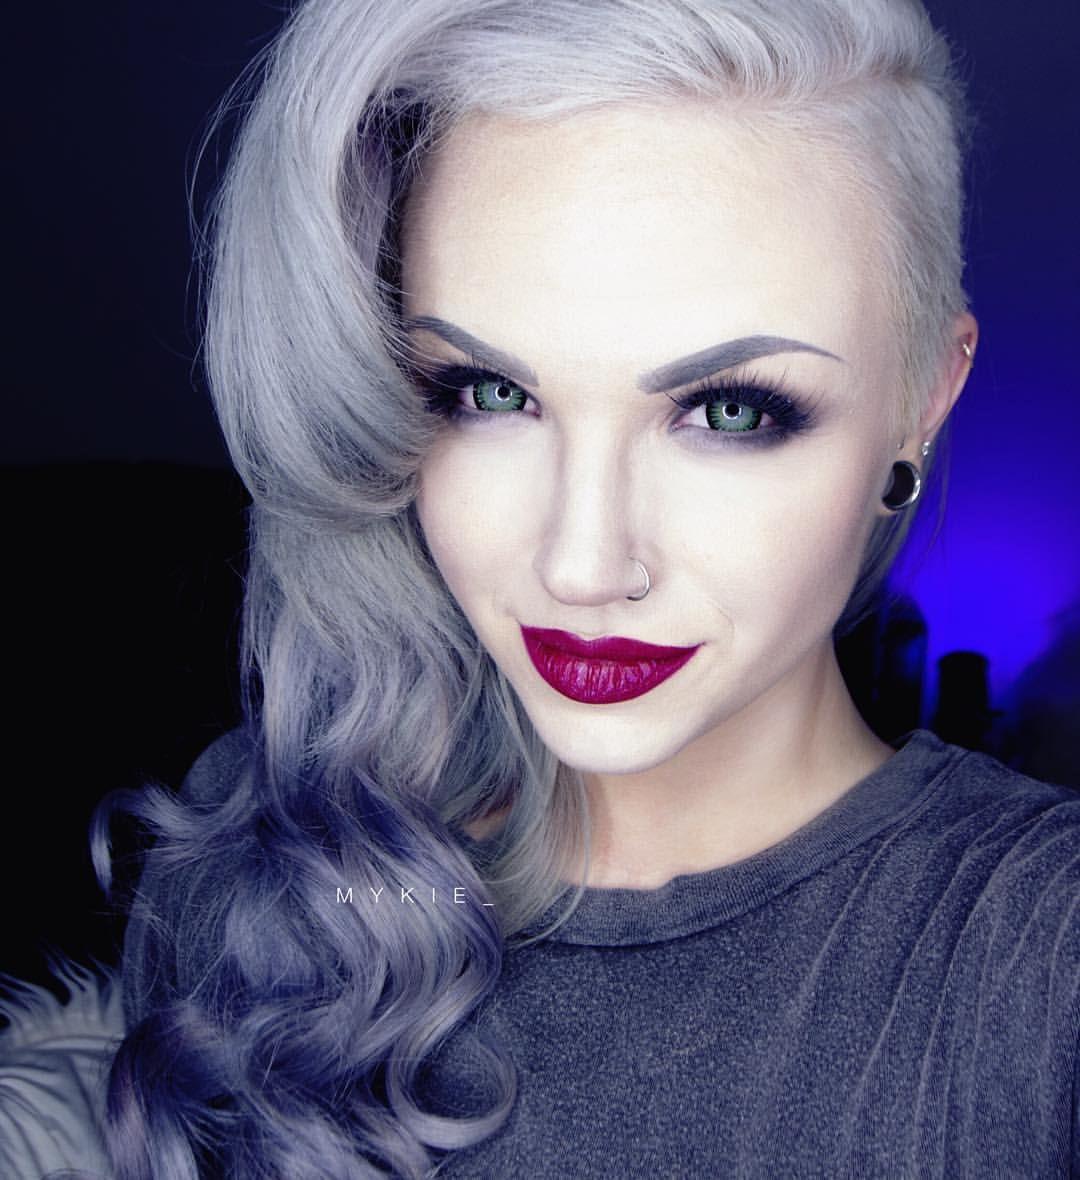 that lipstick! Half shaved hair